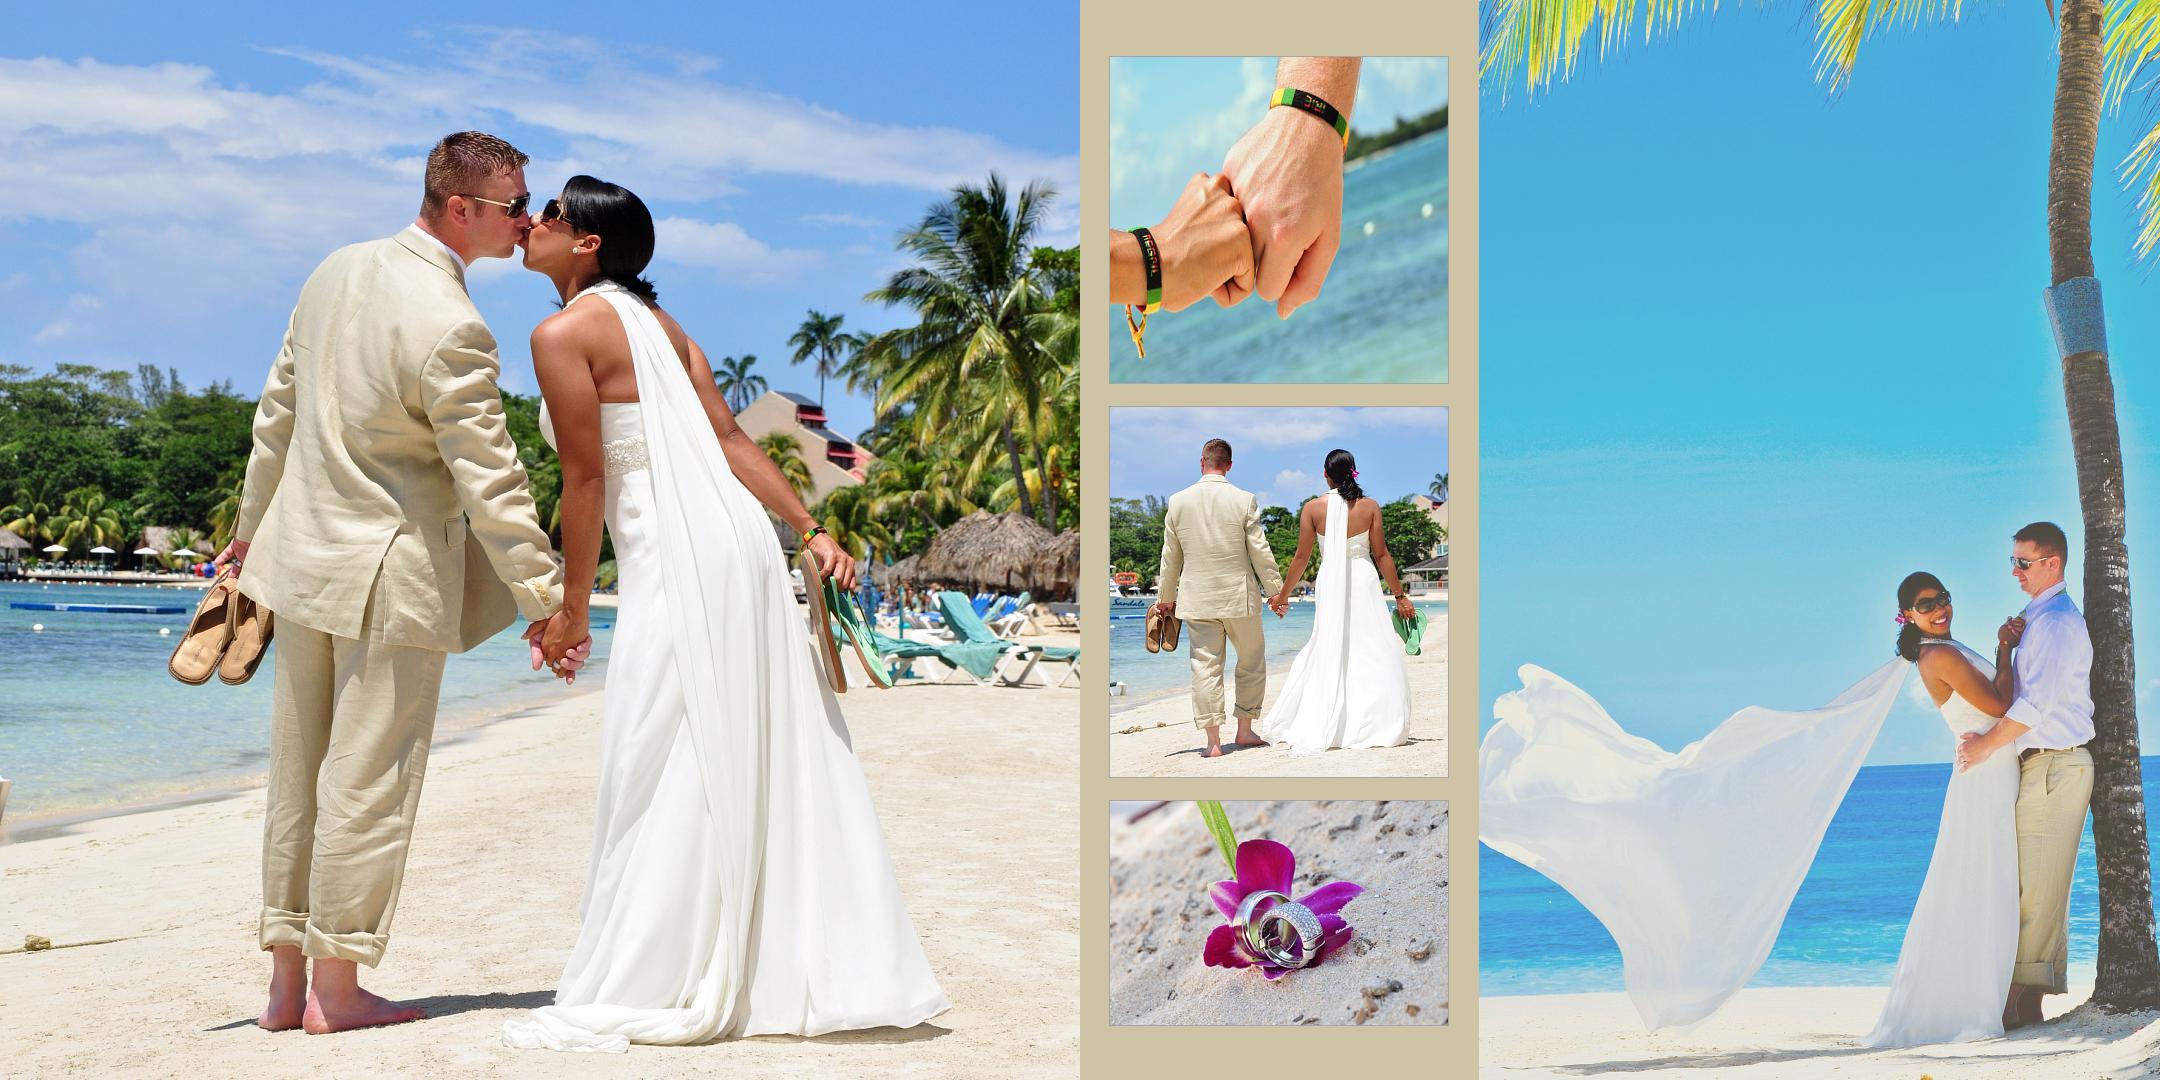 Wedding Photos by Tom Schmidt Chicago (38)